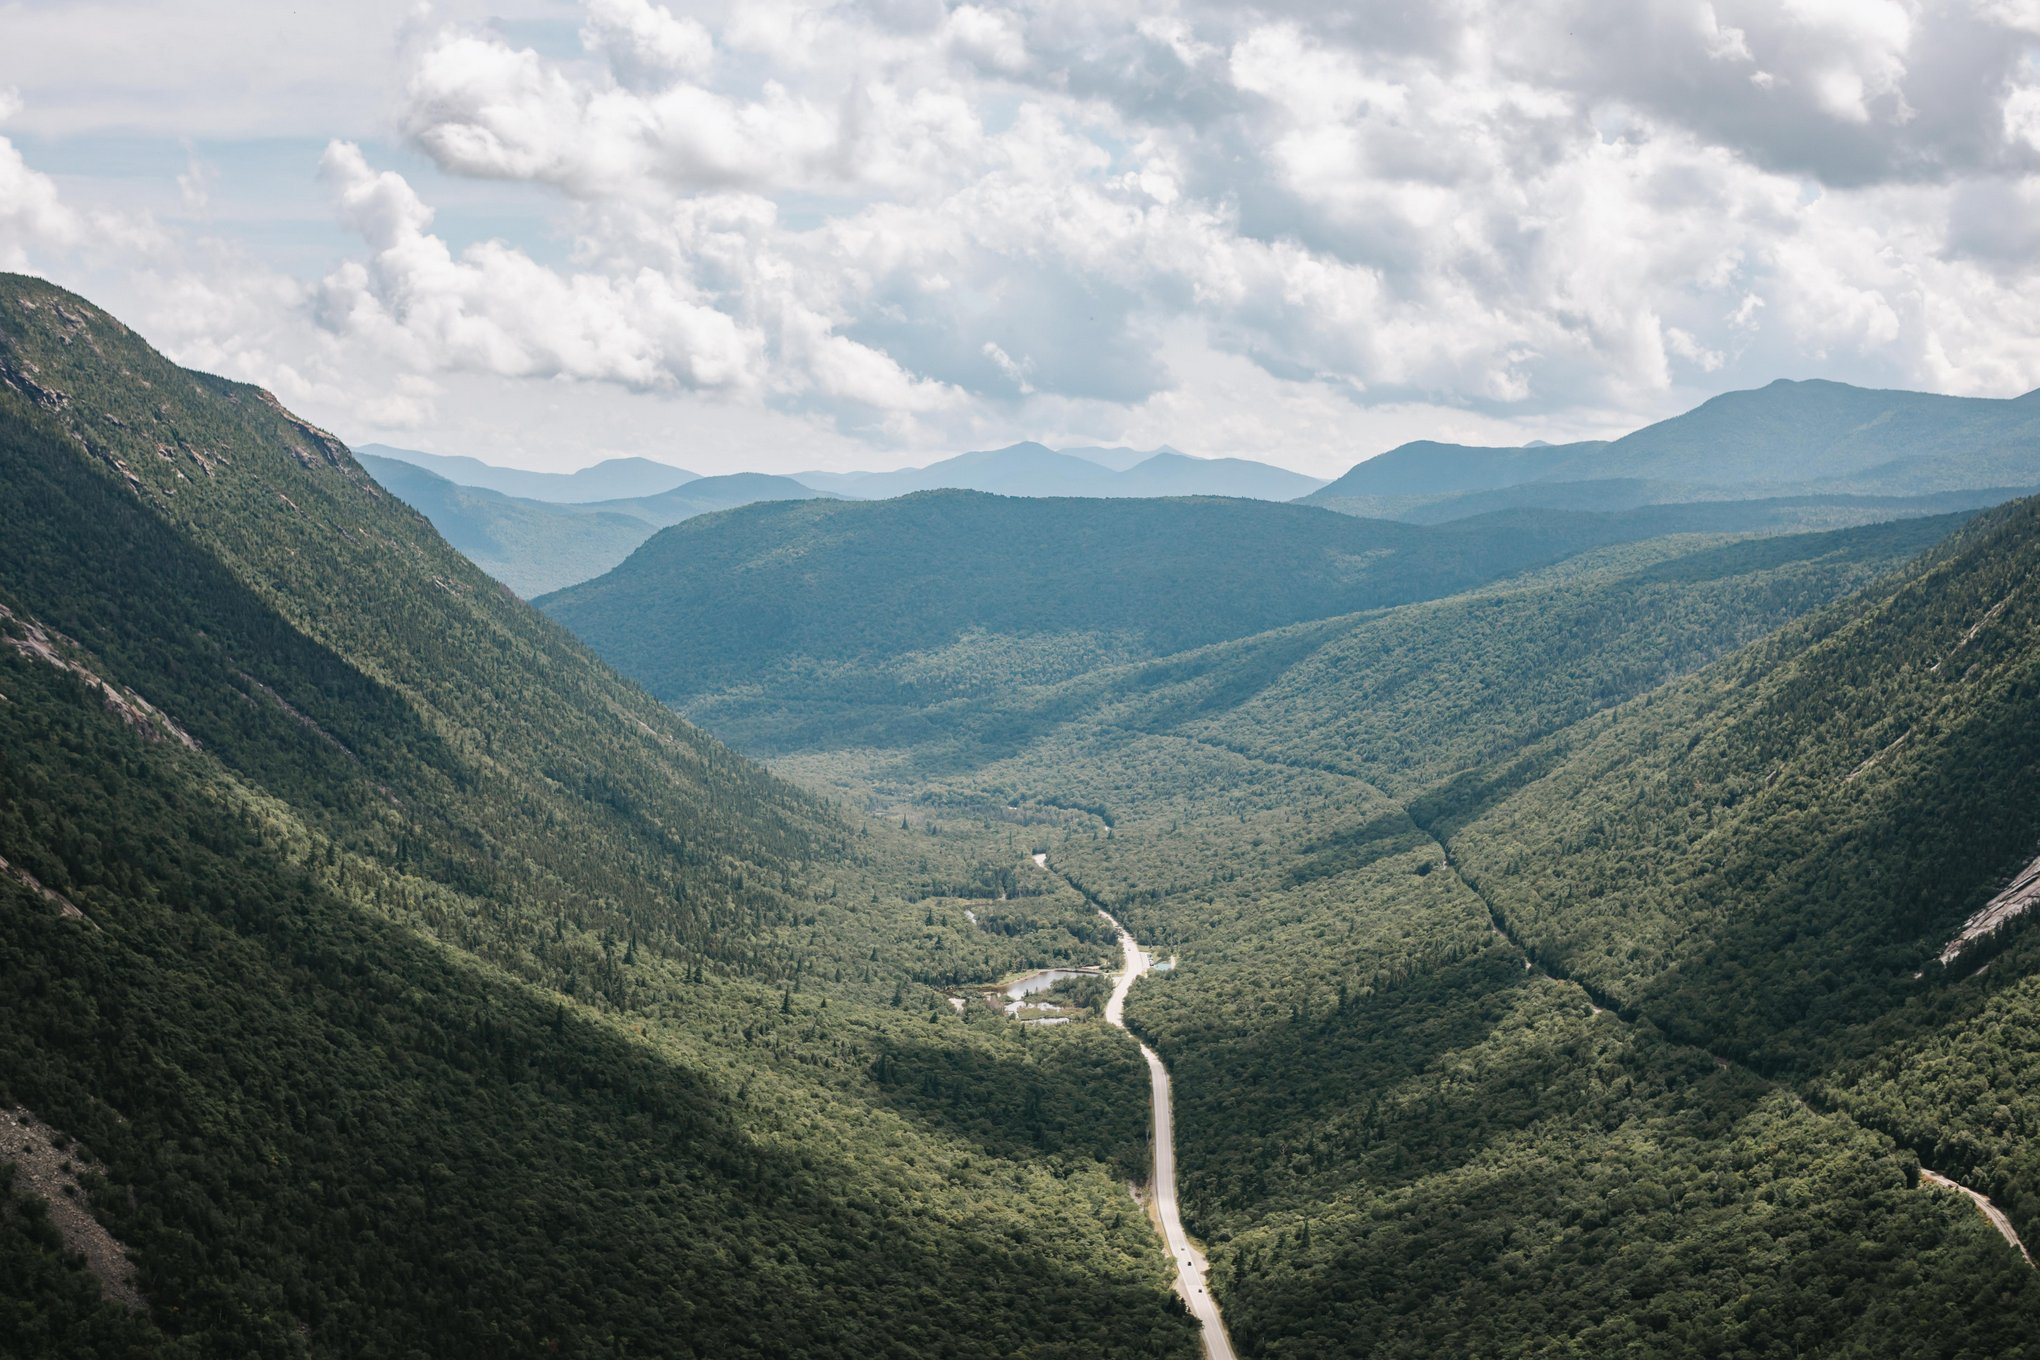 Mount-Willard-White-Mountains-Engagement-Elopement-Lena-Mirisola-11.JPG